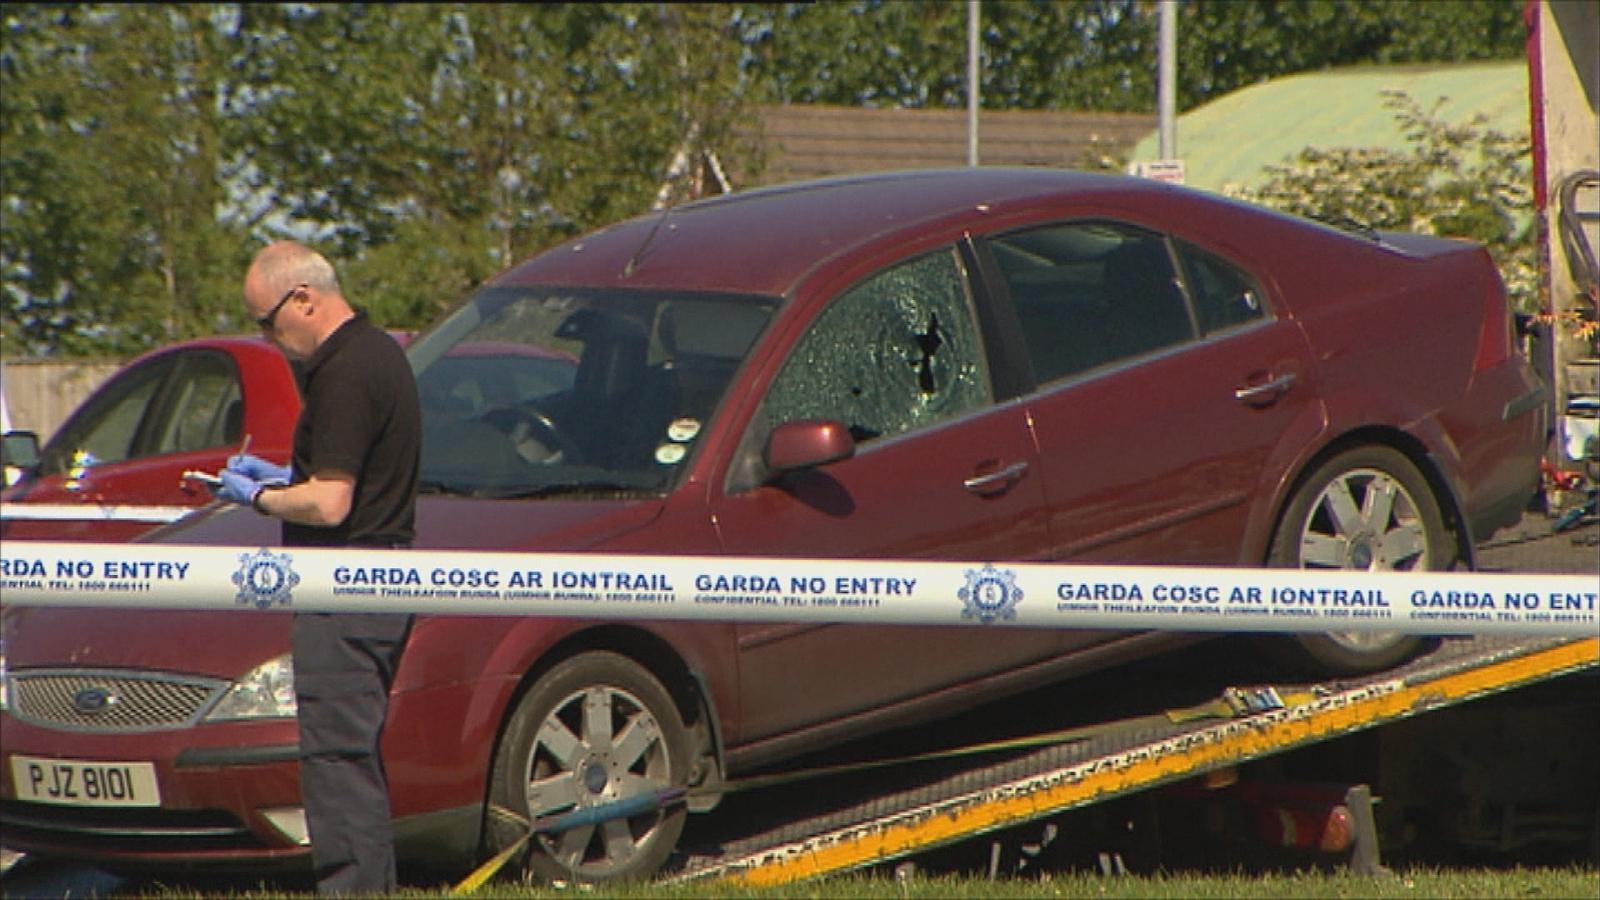 Dublin man admits involvement in murder attempt